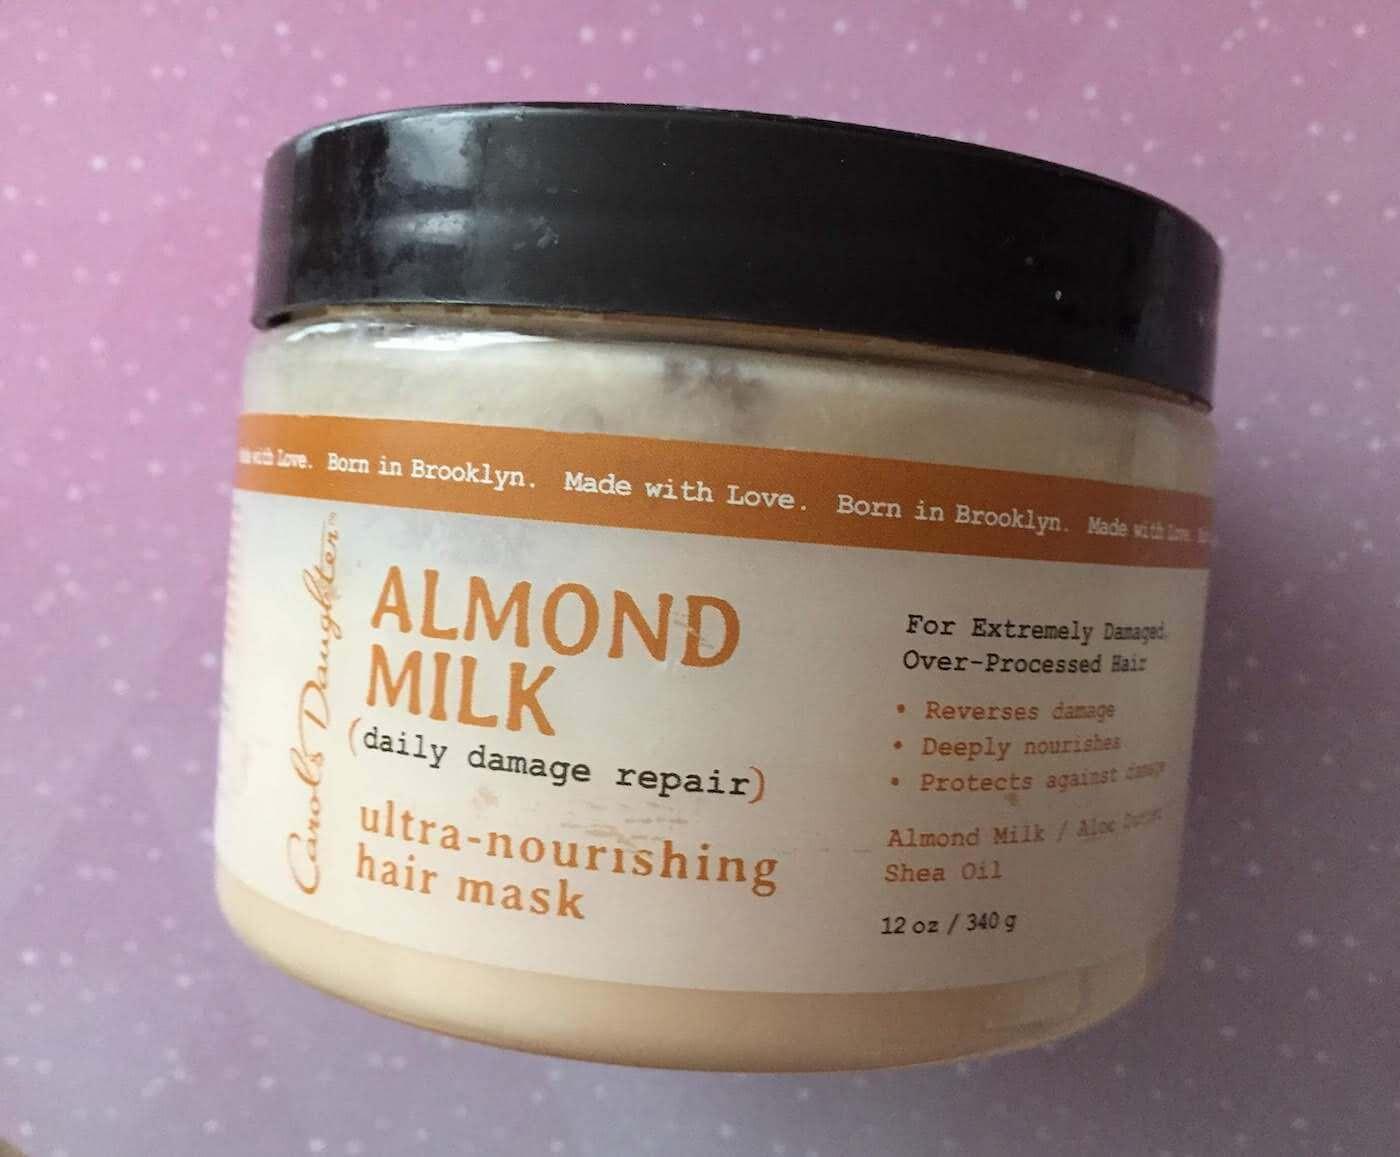 Carol's Daughter almond milk hair mask review